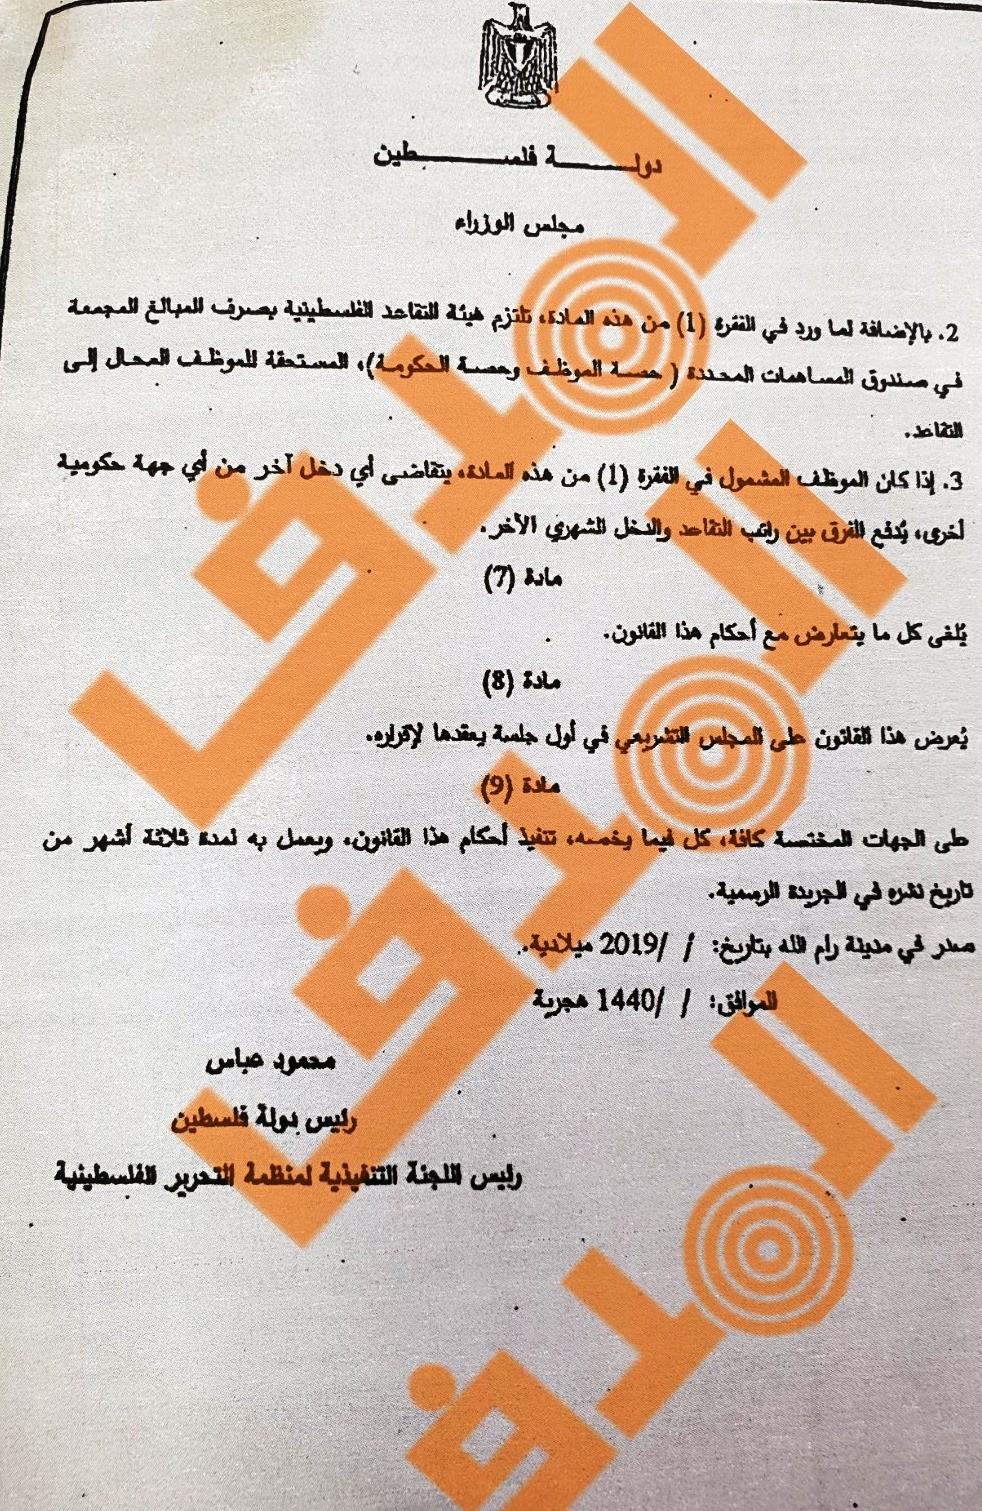 cdc5f7f5-2b19-4bf1-884f-dfac4da1128b.jpg